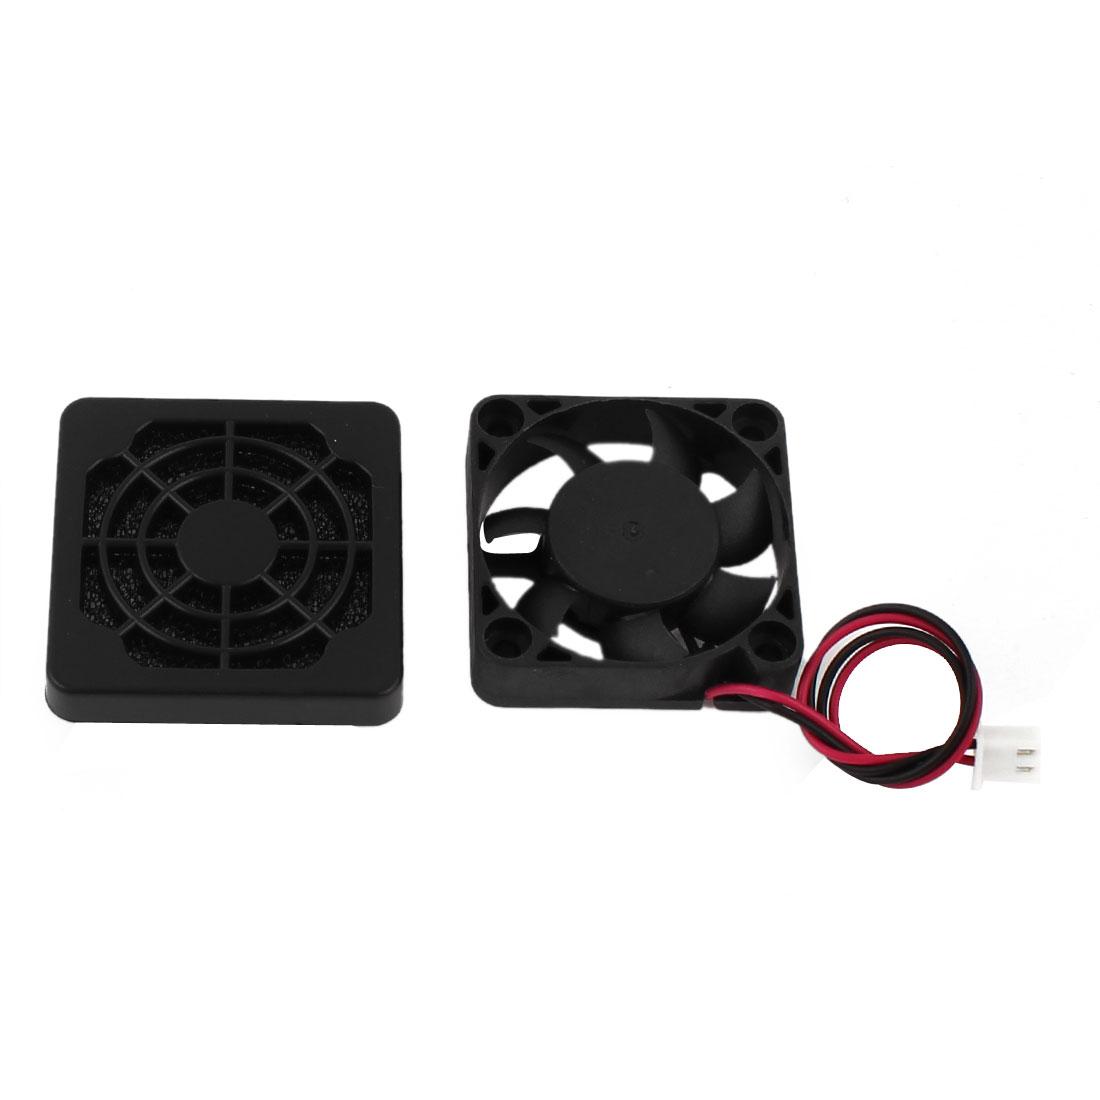 40mm x 10mm 4010 DC 24V Brushless PC Case Cooling Fan w Dustproof Mesh